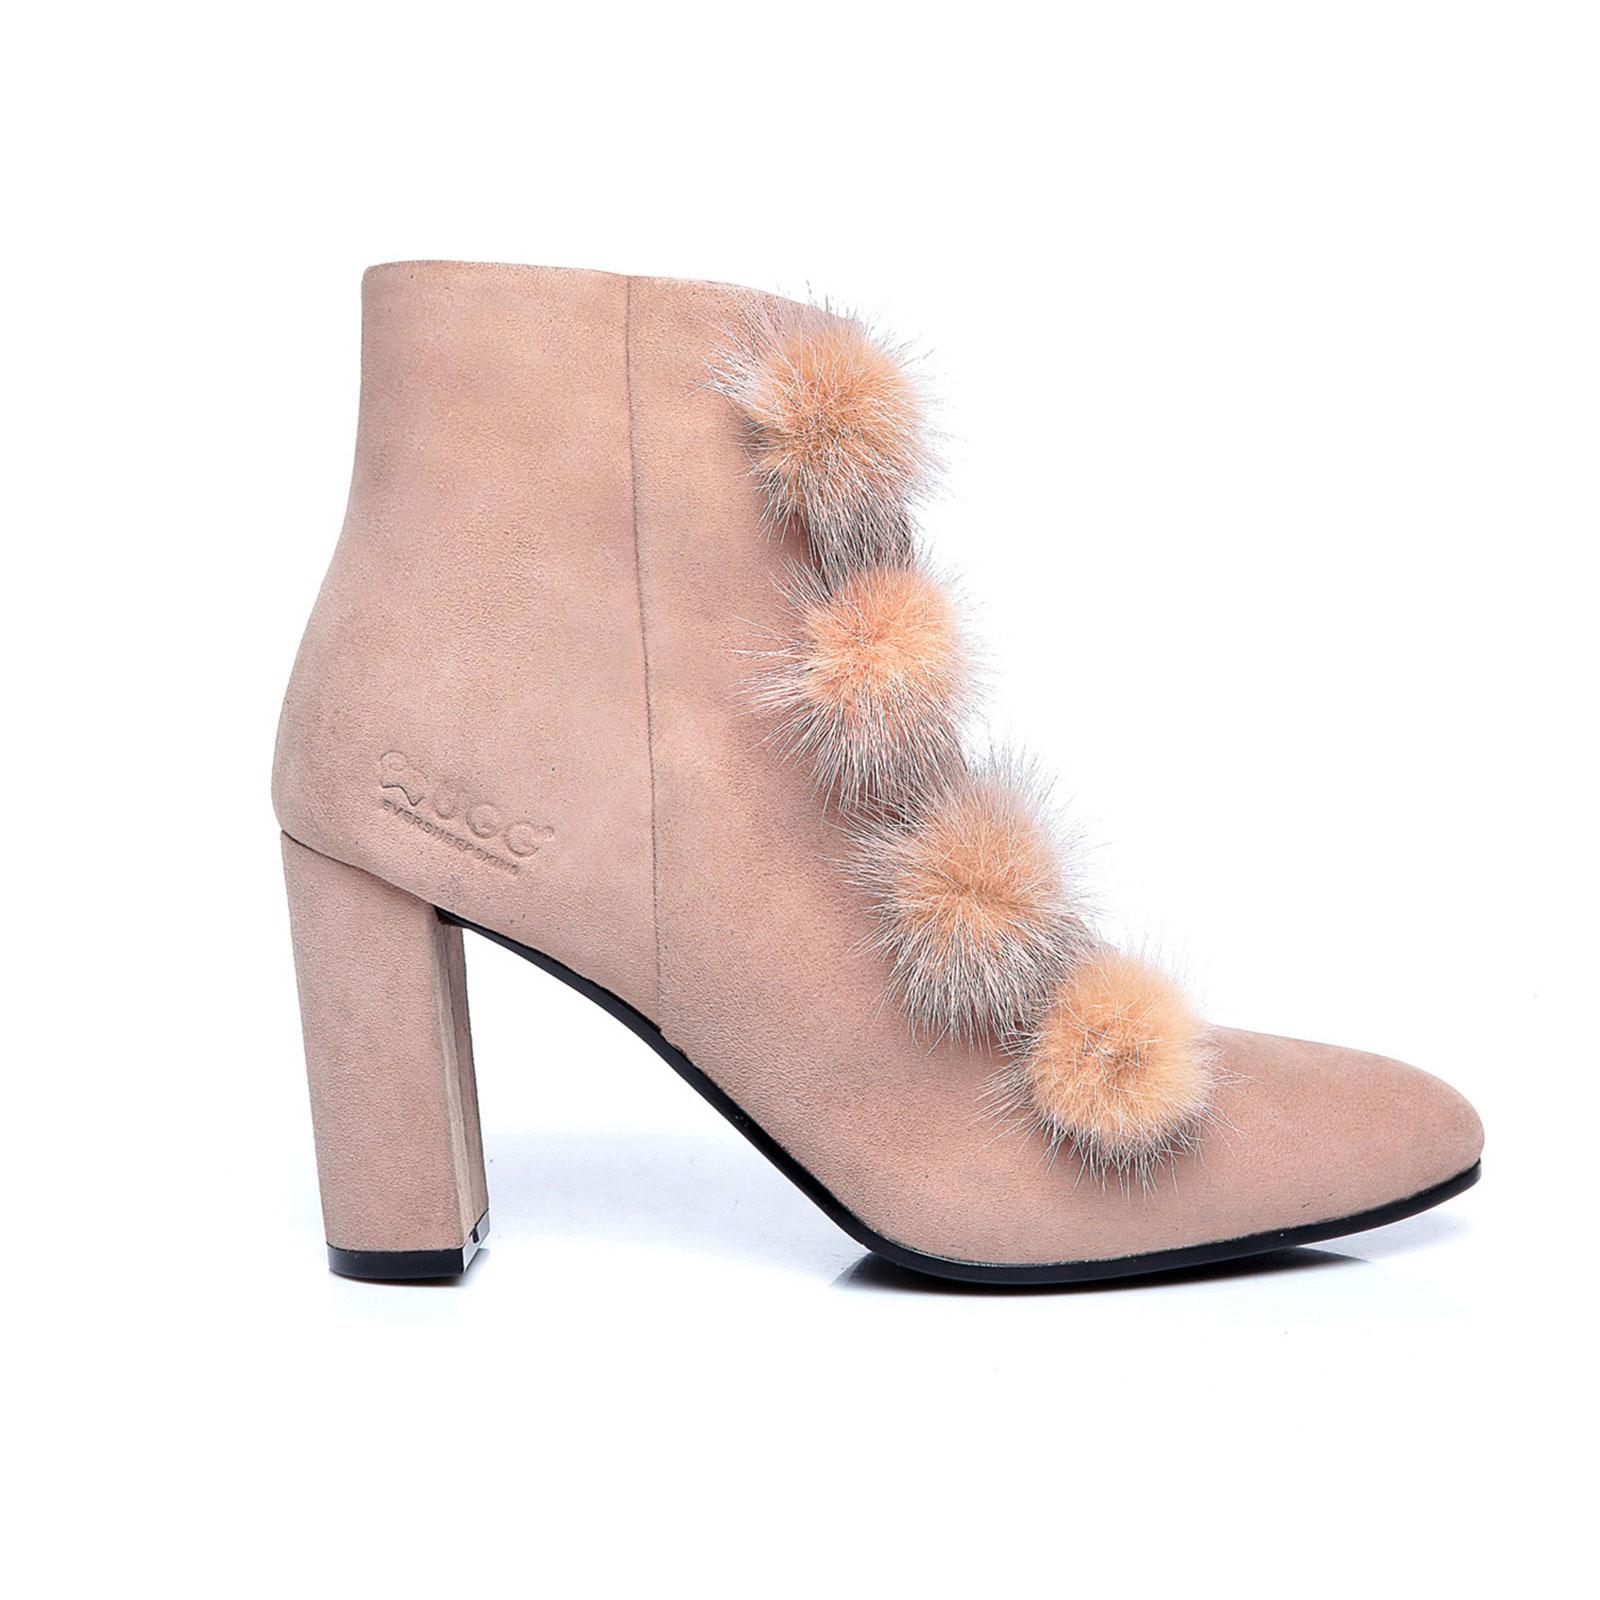 UGG-Boots-Michelle-Ladies-High-Heel-Kid-Suede-